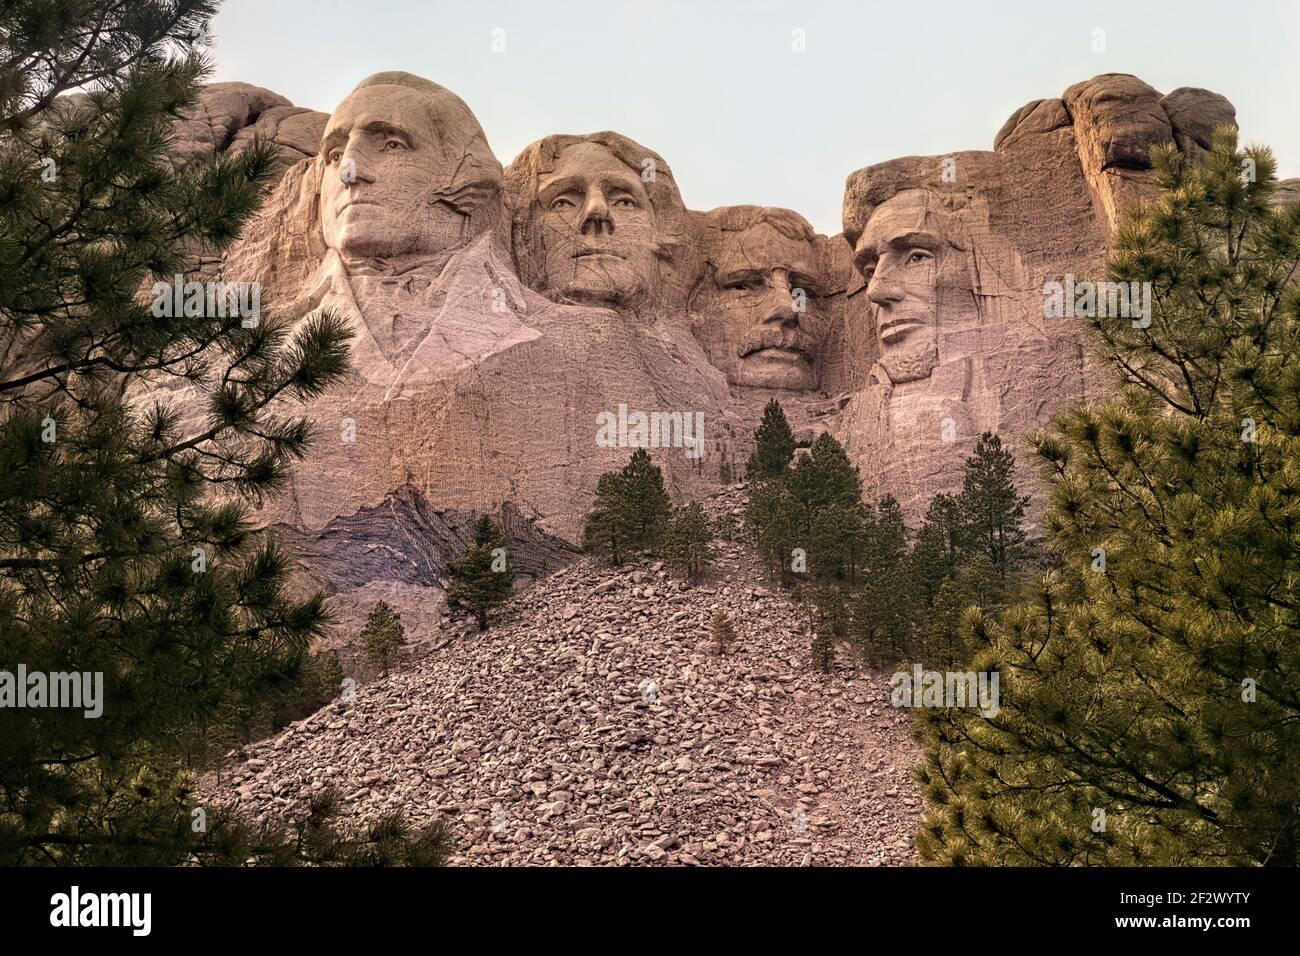 Presidents sculptures at Mount Rushmore National Memorial, South Dakota, USA Stock Photo